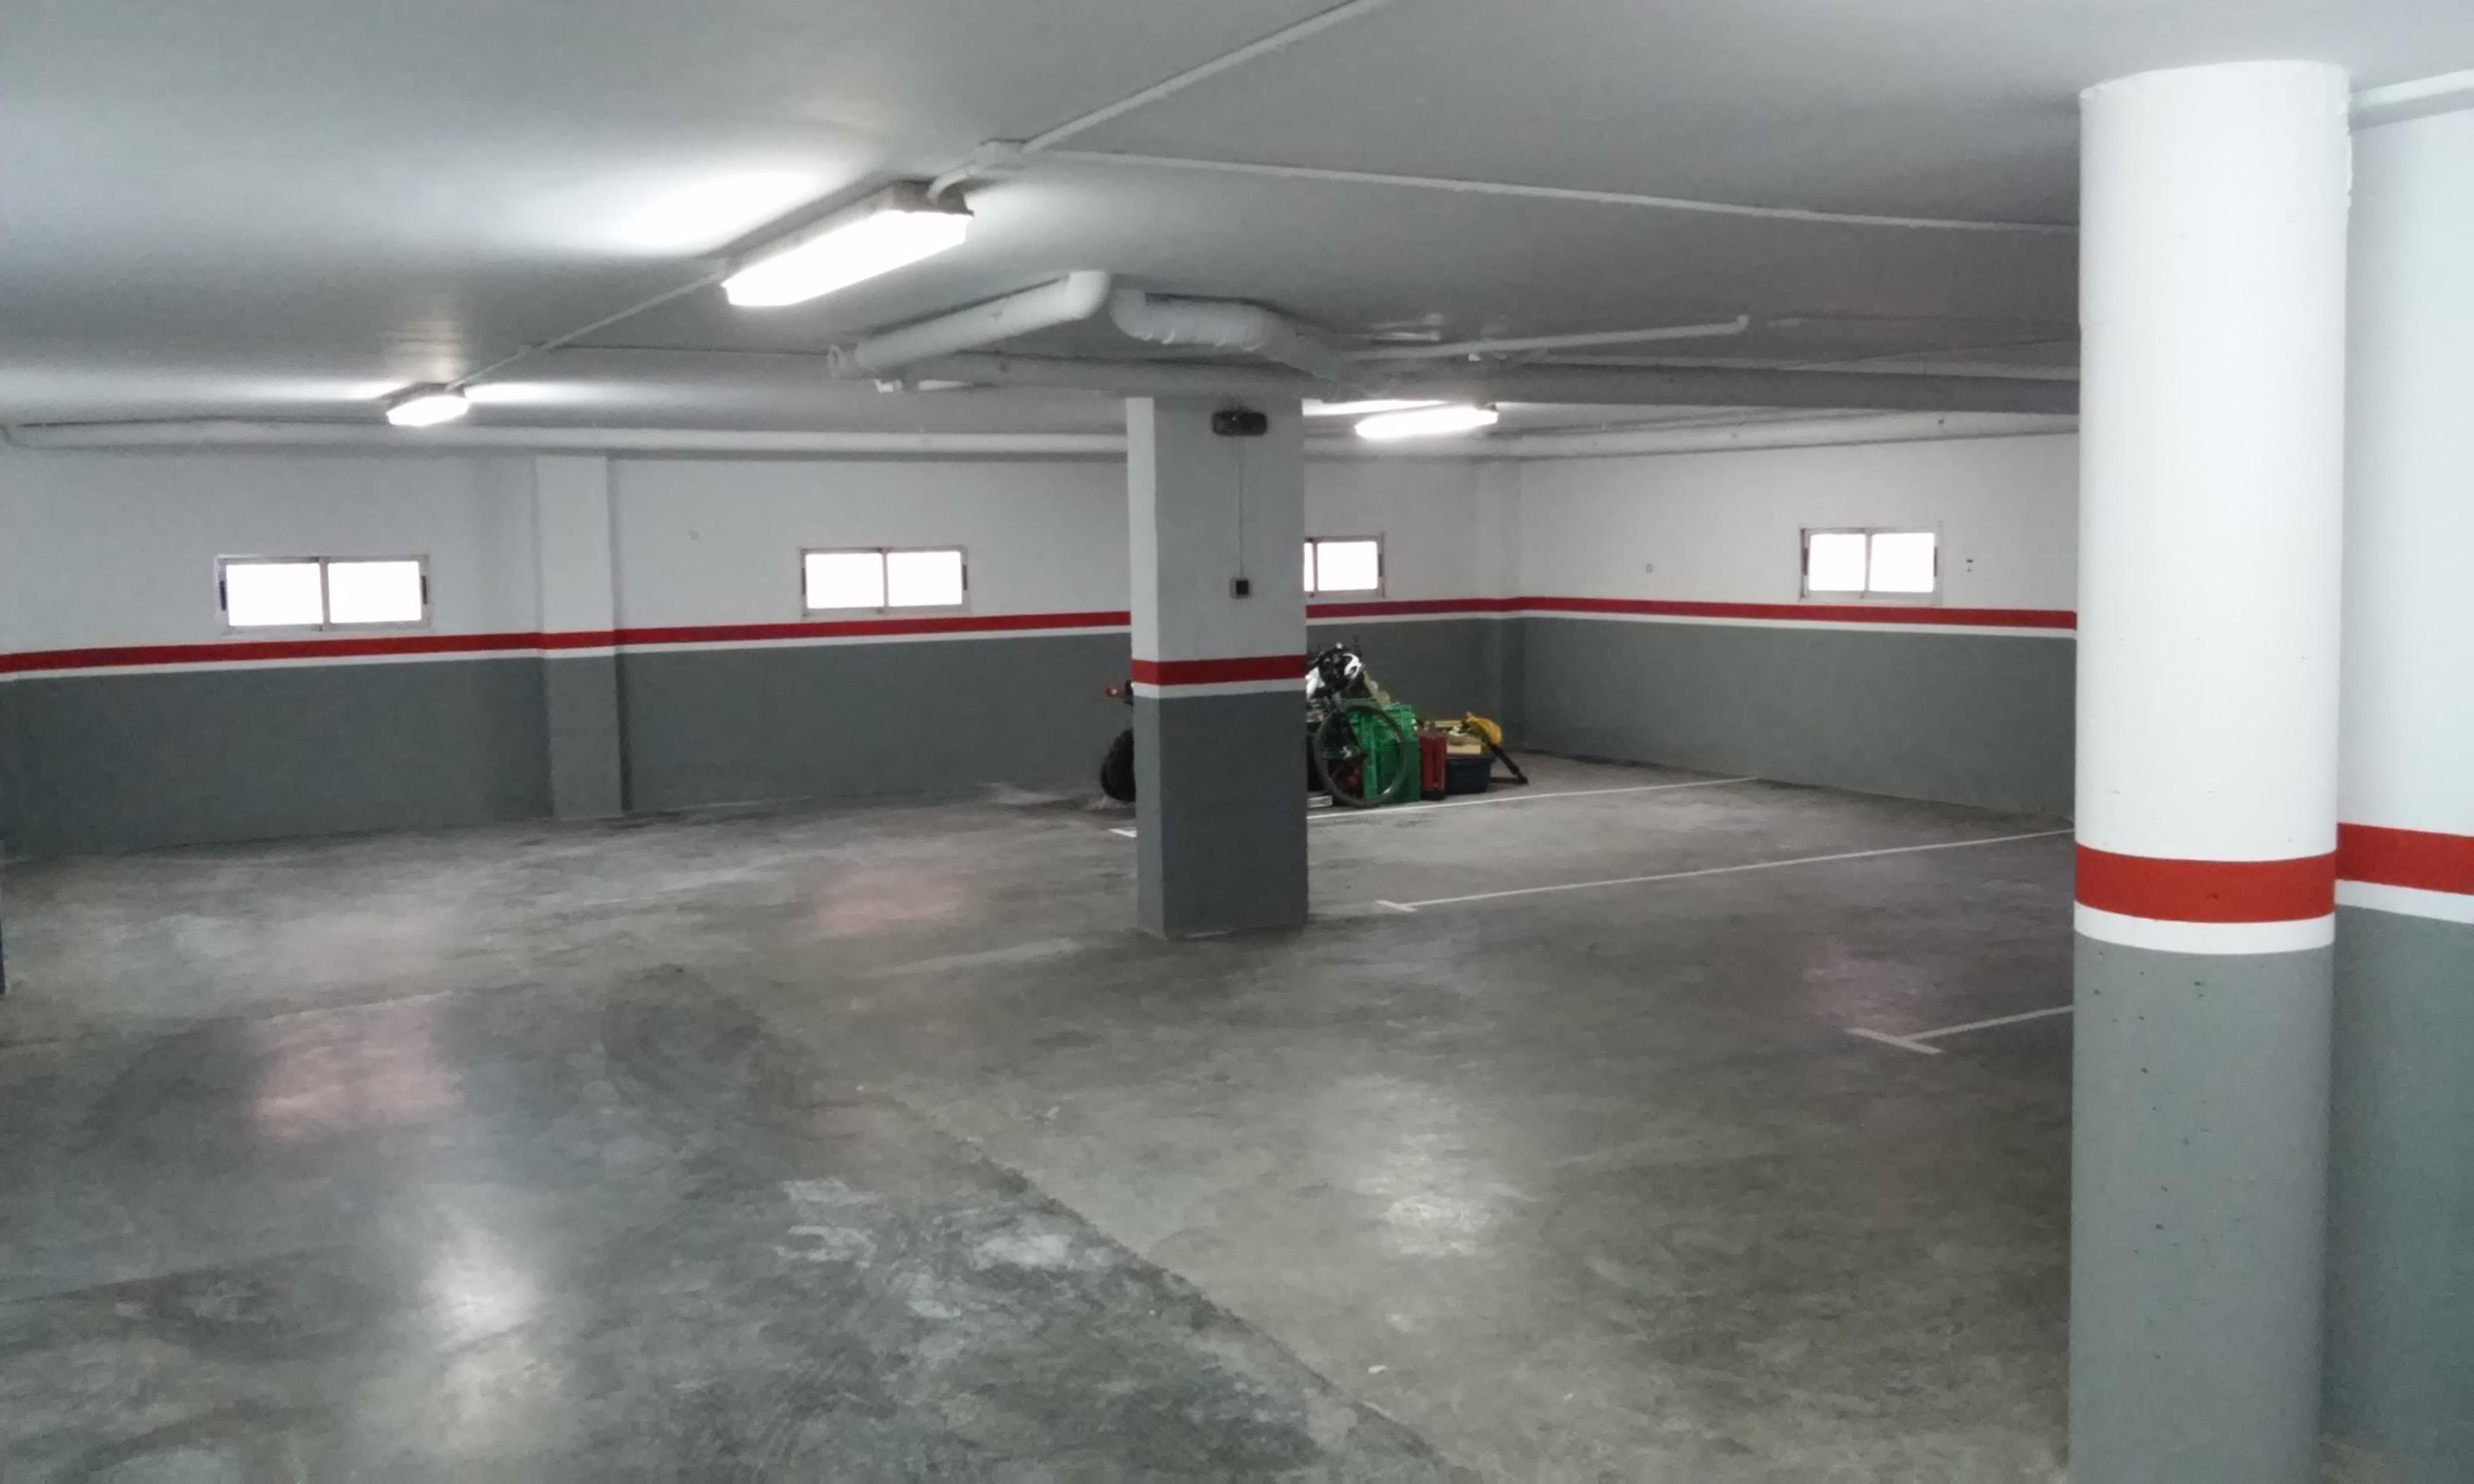 Pintura de garaje pinturasvillena for Pintura suelo parking